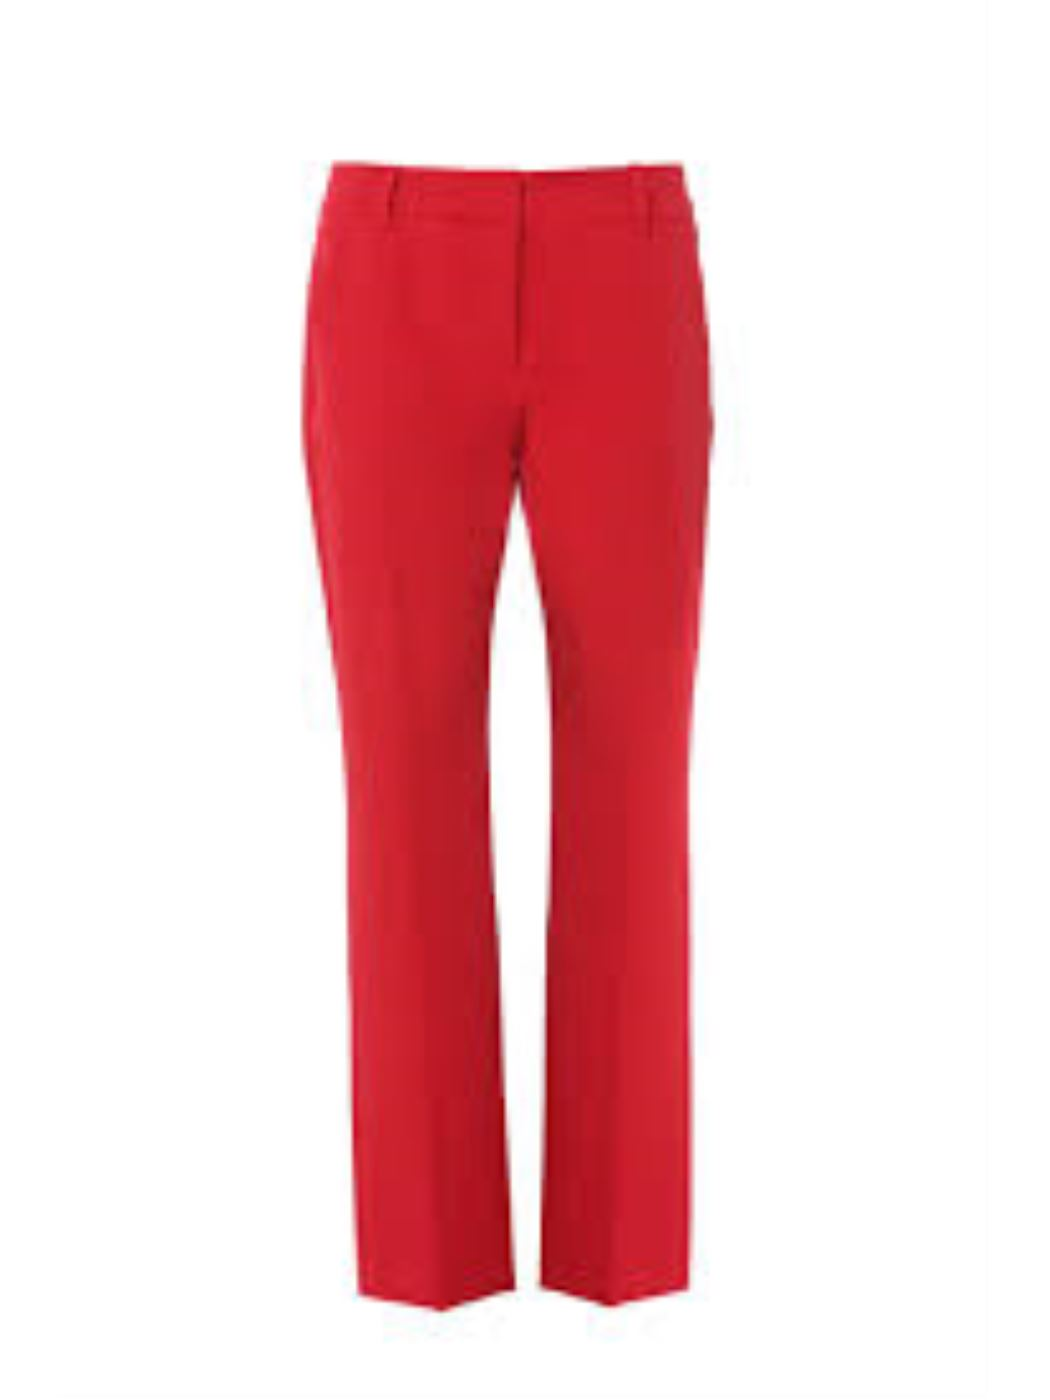 Silvian heach pantalone classico PGP19796PA